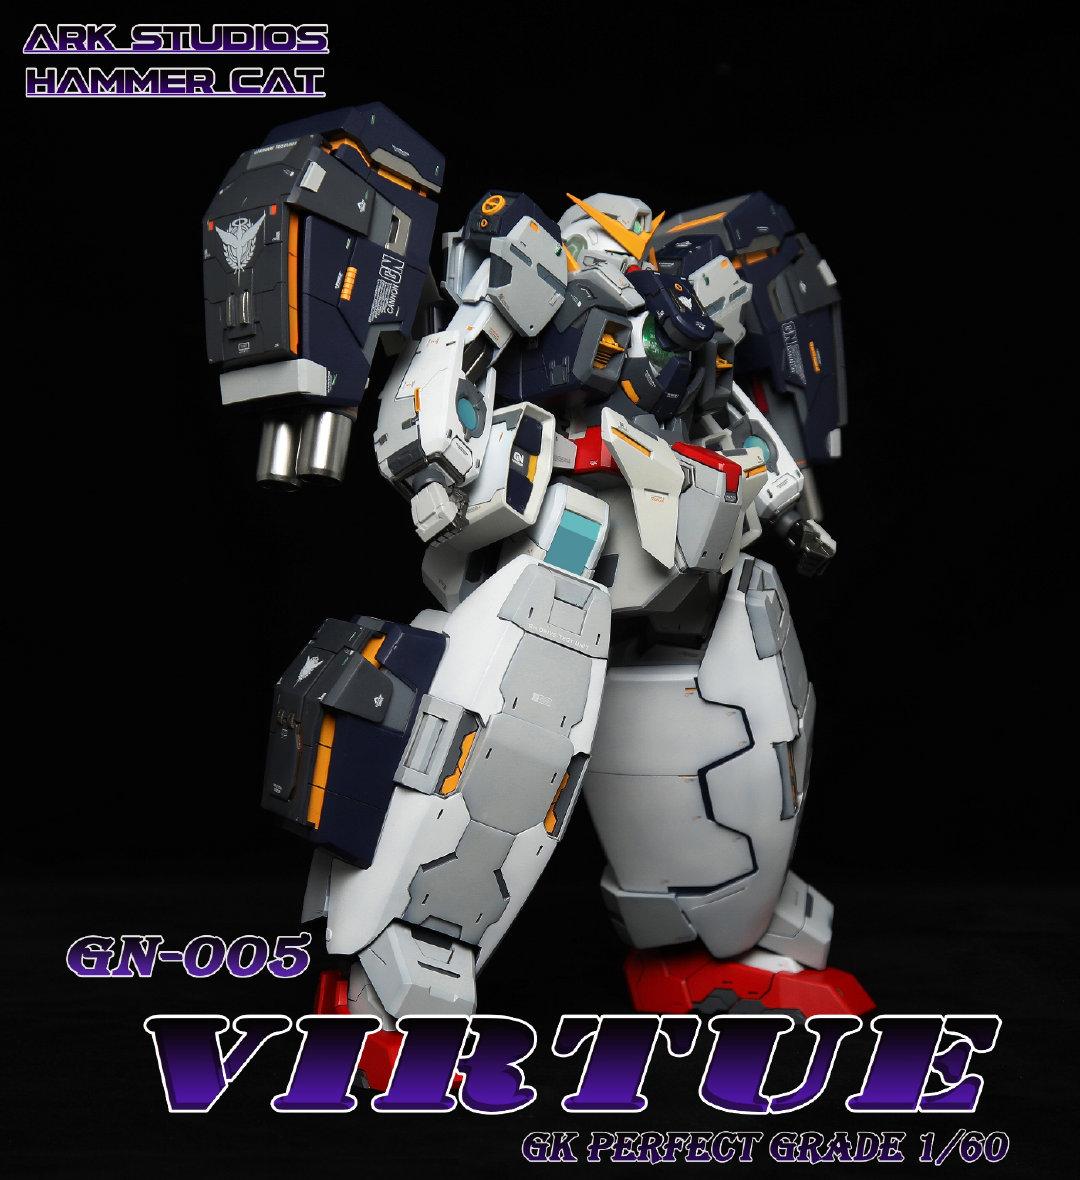 G389_60_virtue_nadleeh_014.jpg